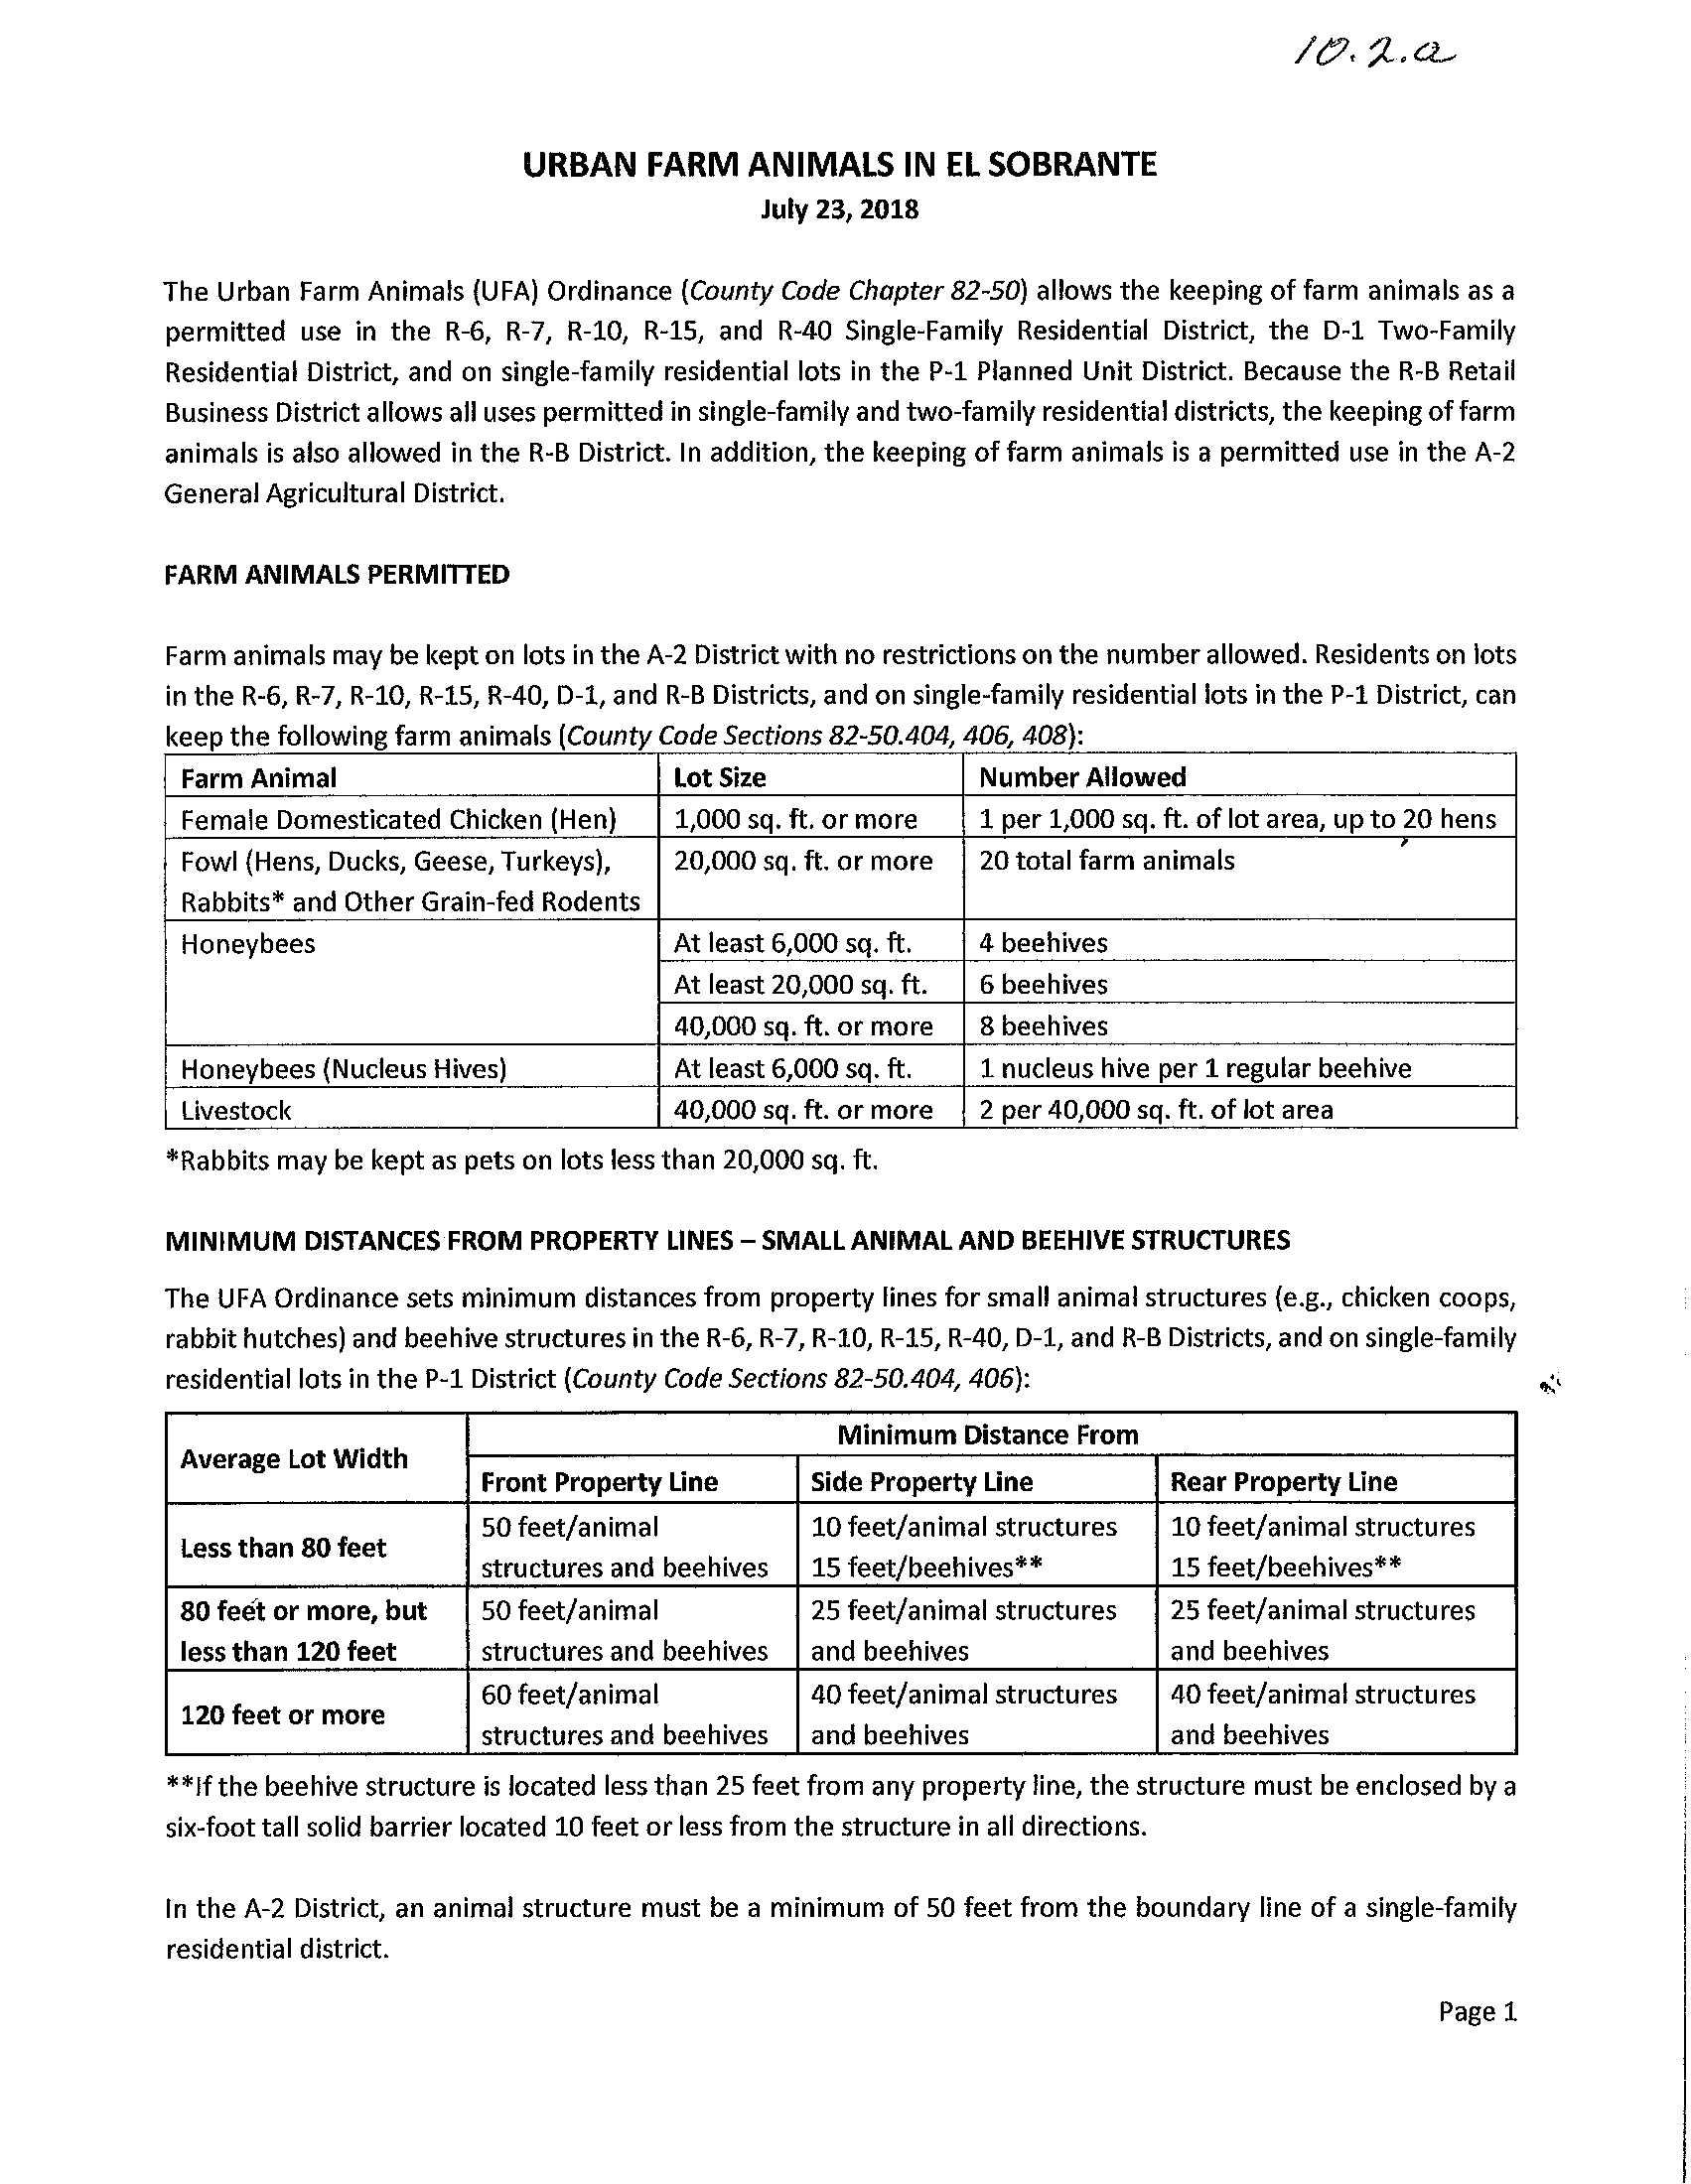 ESMAC Agenda 08.08.2018 (17 Pages)_11.jpg